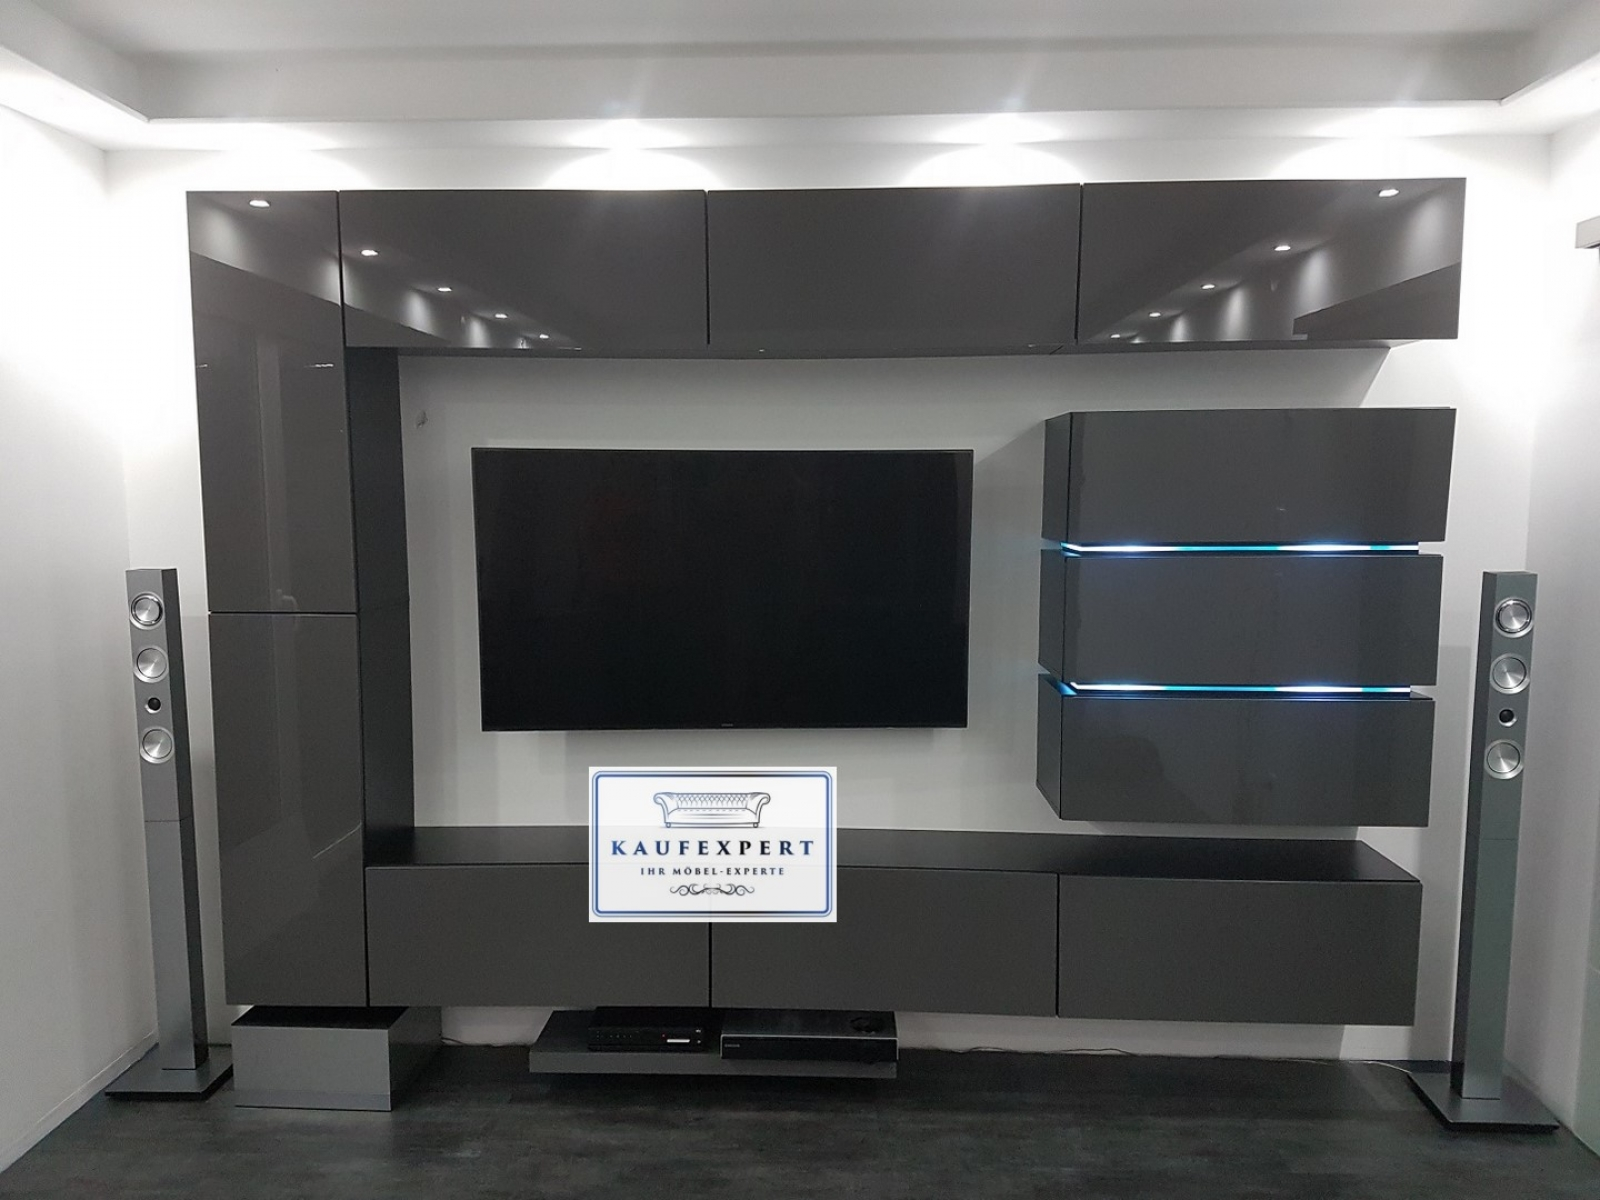 Kaufexpert wohnwand shine grau hochglanz schwarz 284 cm for Wohnwand modern grau